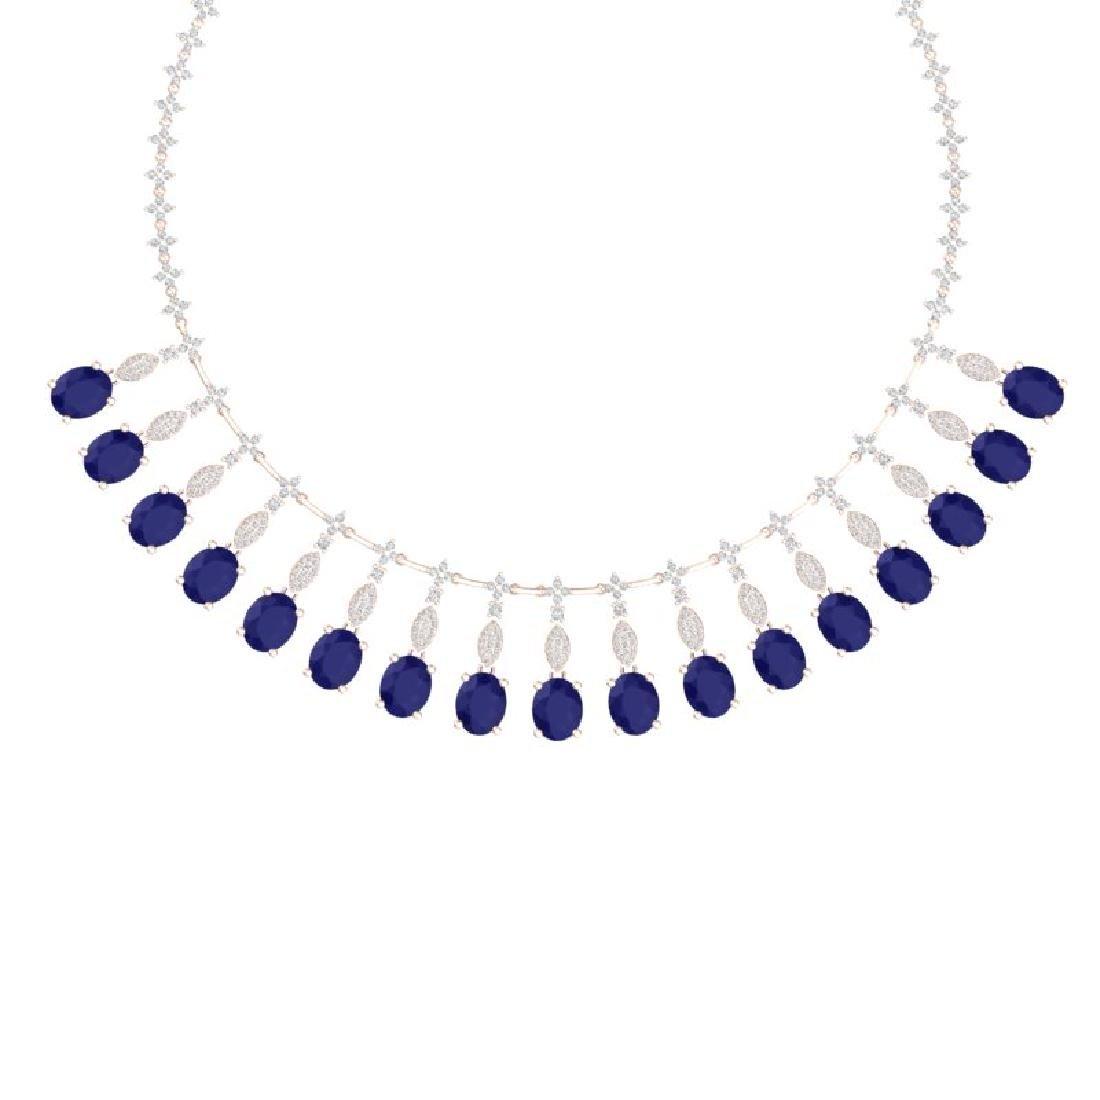 65.62 CTW Royalty Sapphire & VS Diamond Necklace 18K - 2